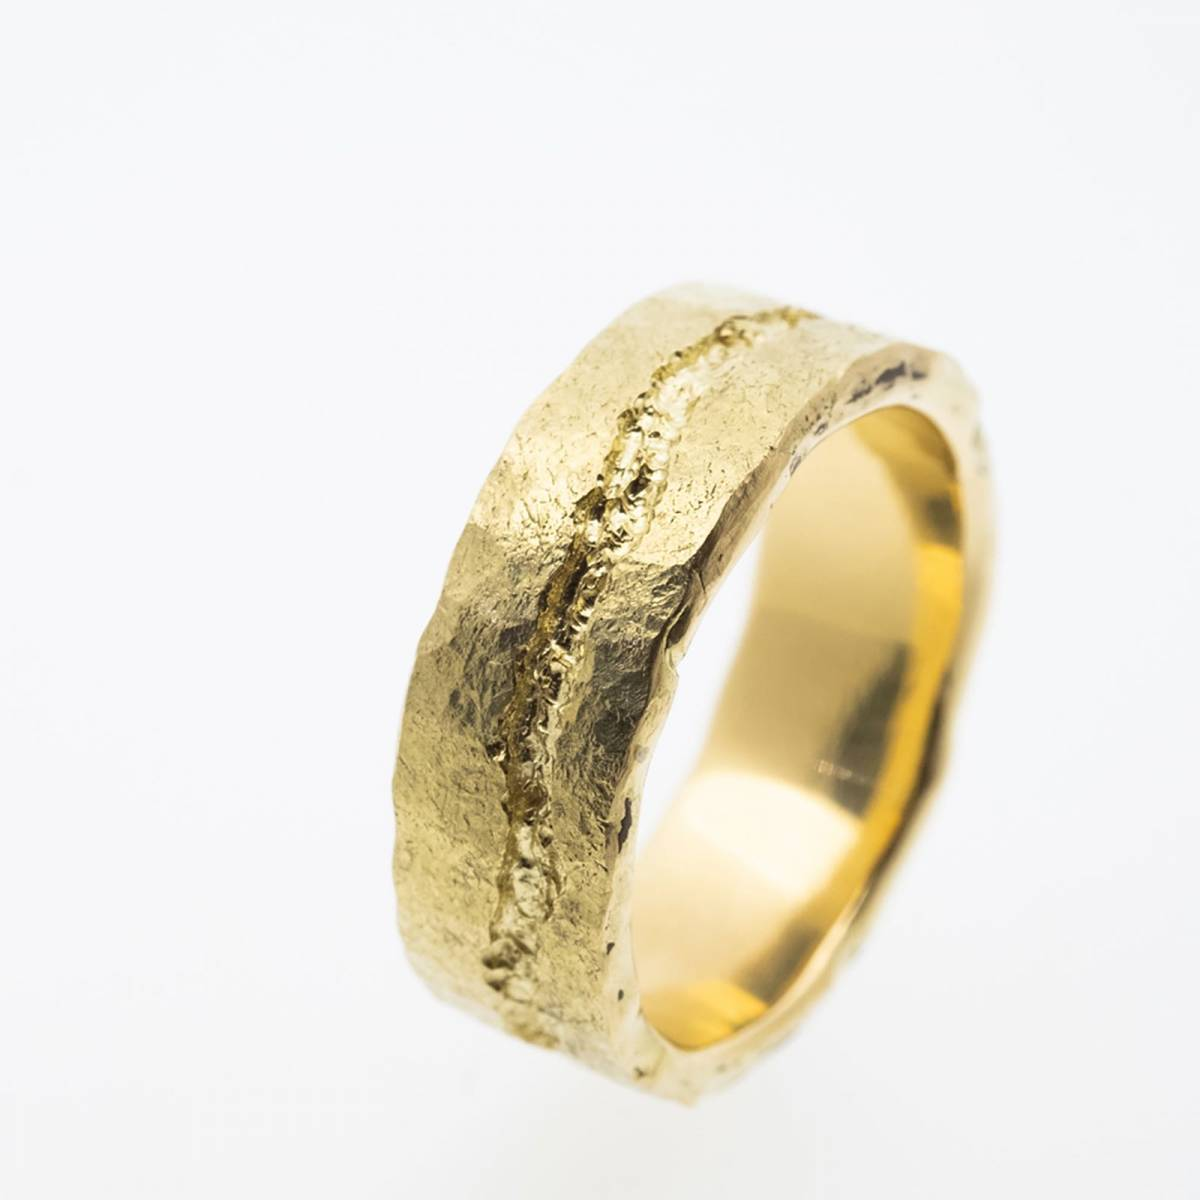 Jonas Maes Jewels - Juwelen - Bruidsjuwelen - Verlovingsring - Trouwring - House of Weddings - 1